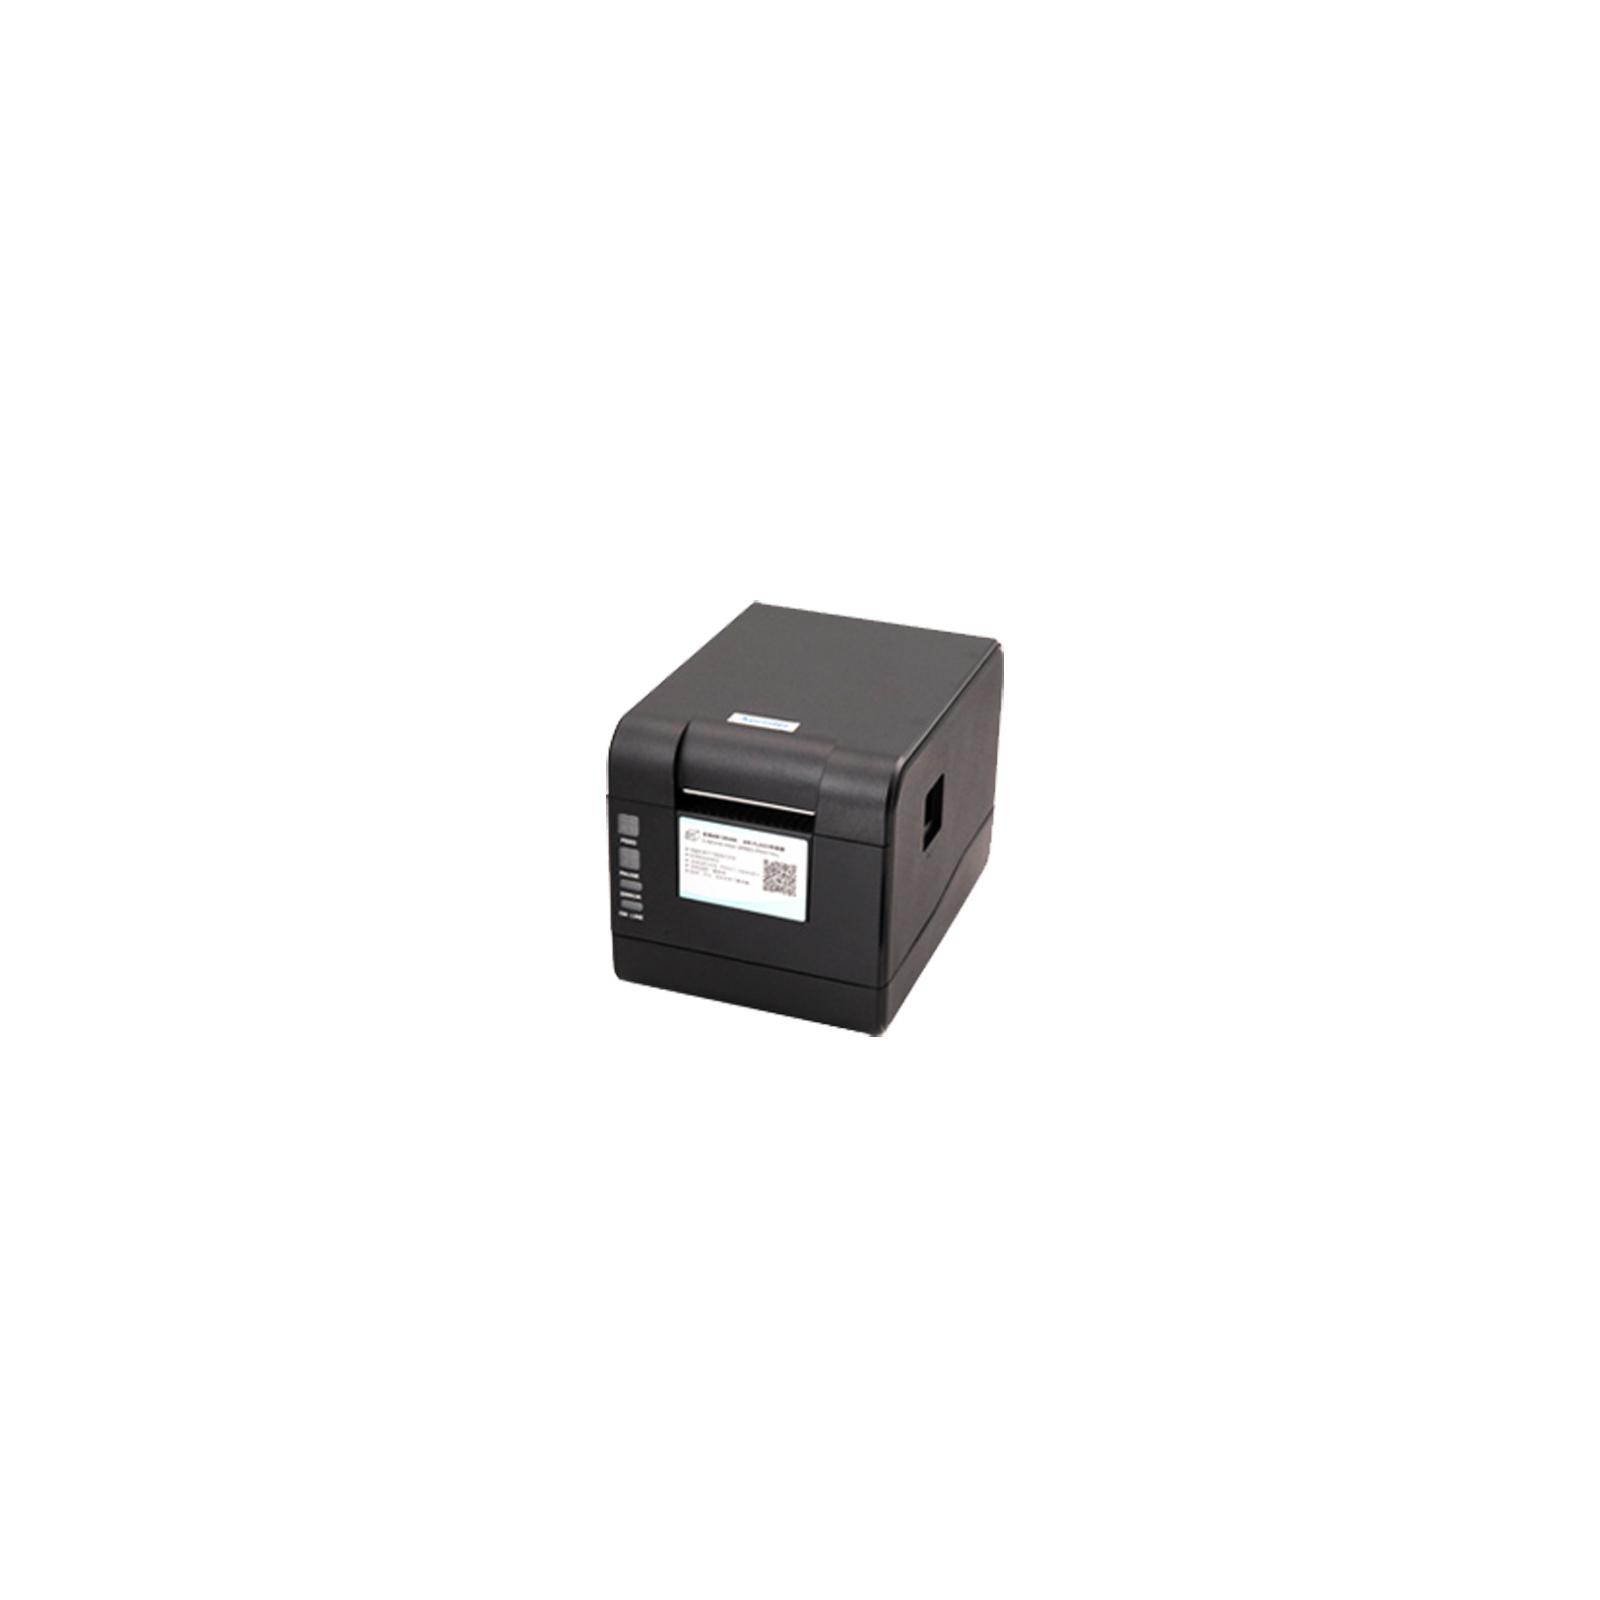 Принтер этикеток X-PRINTER XP-233B